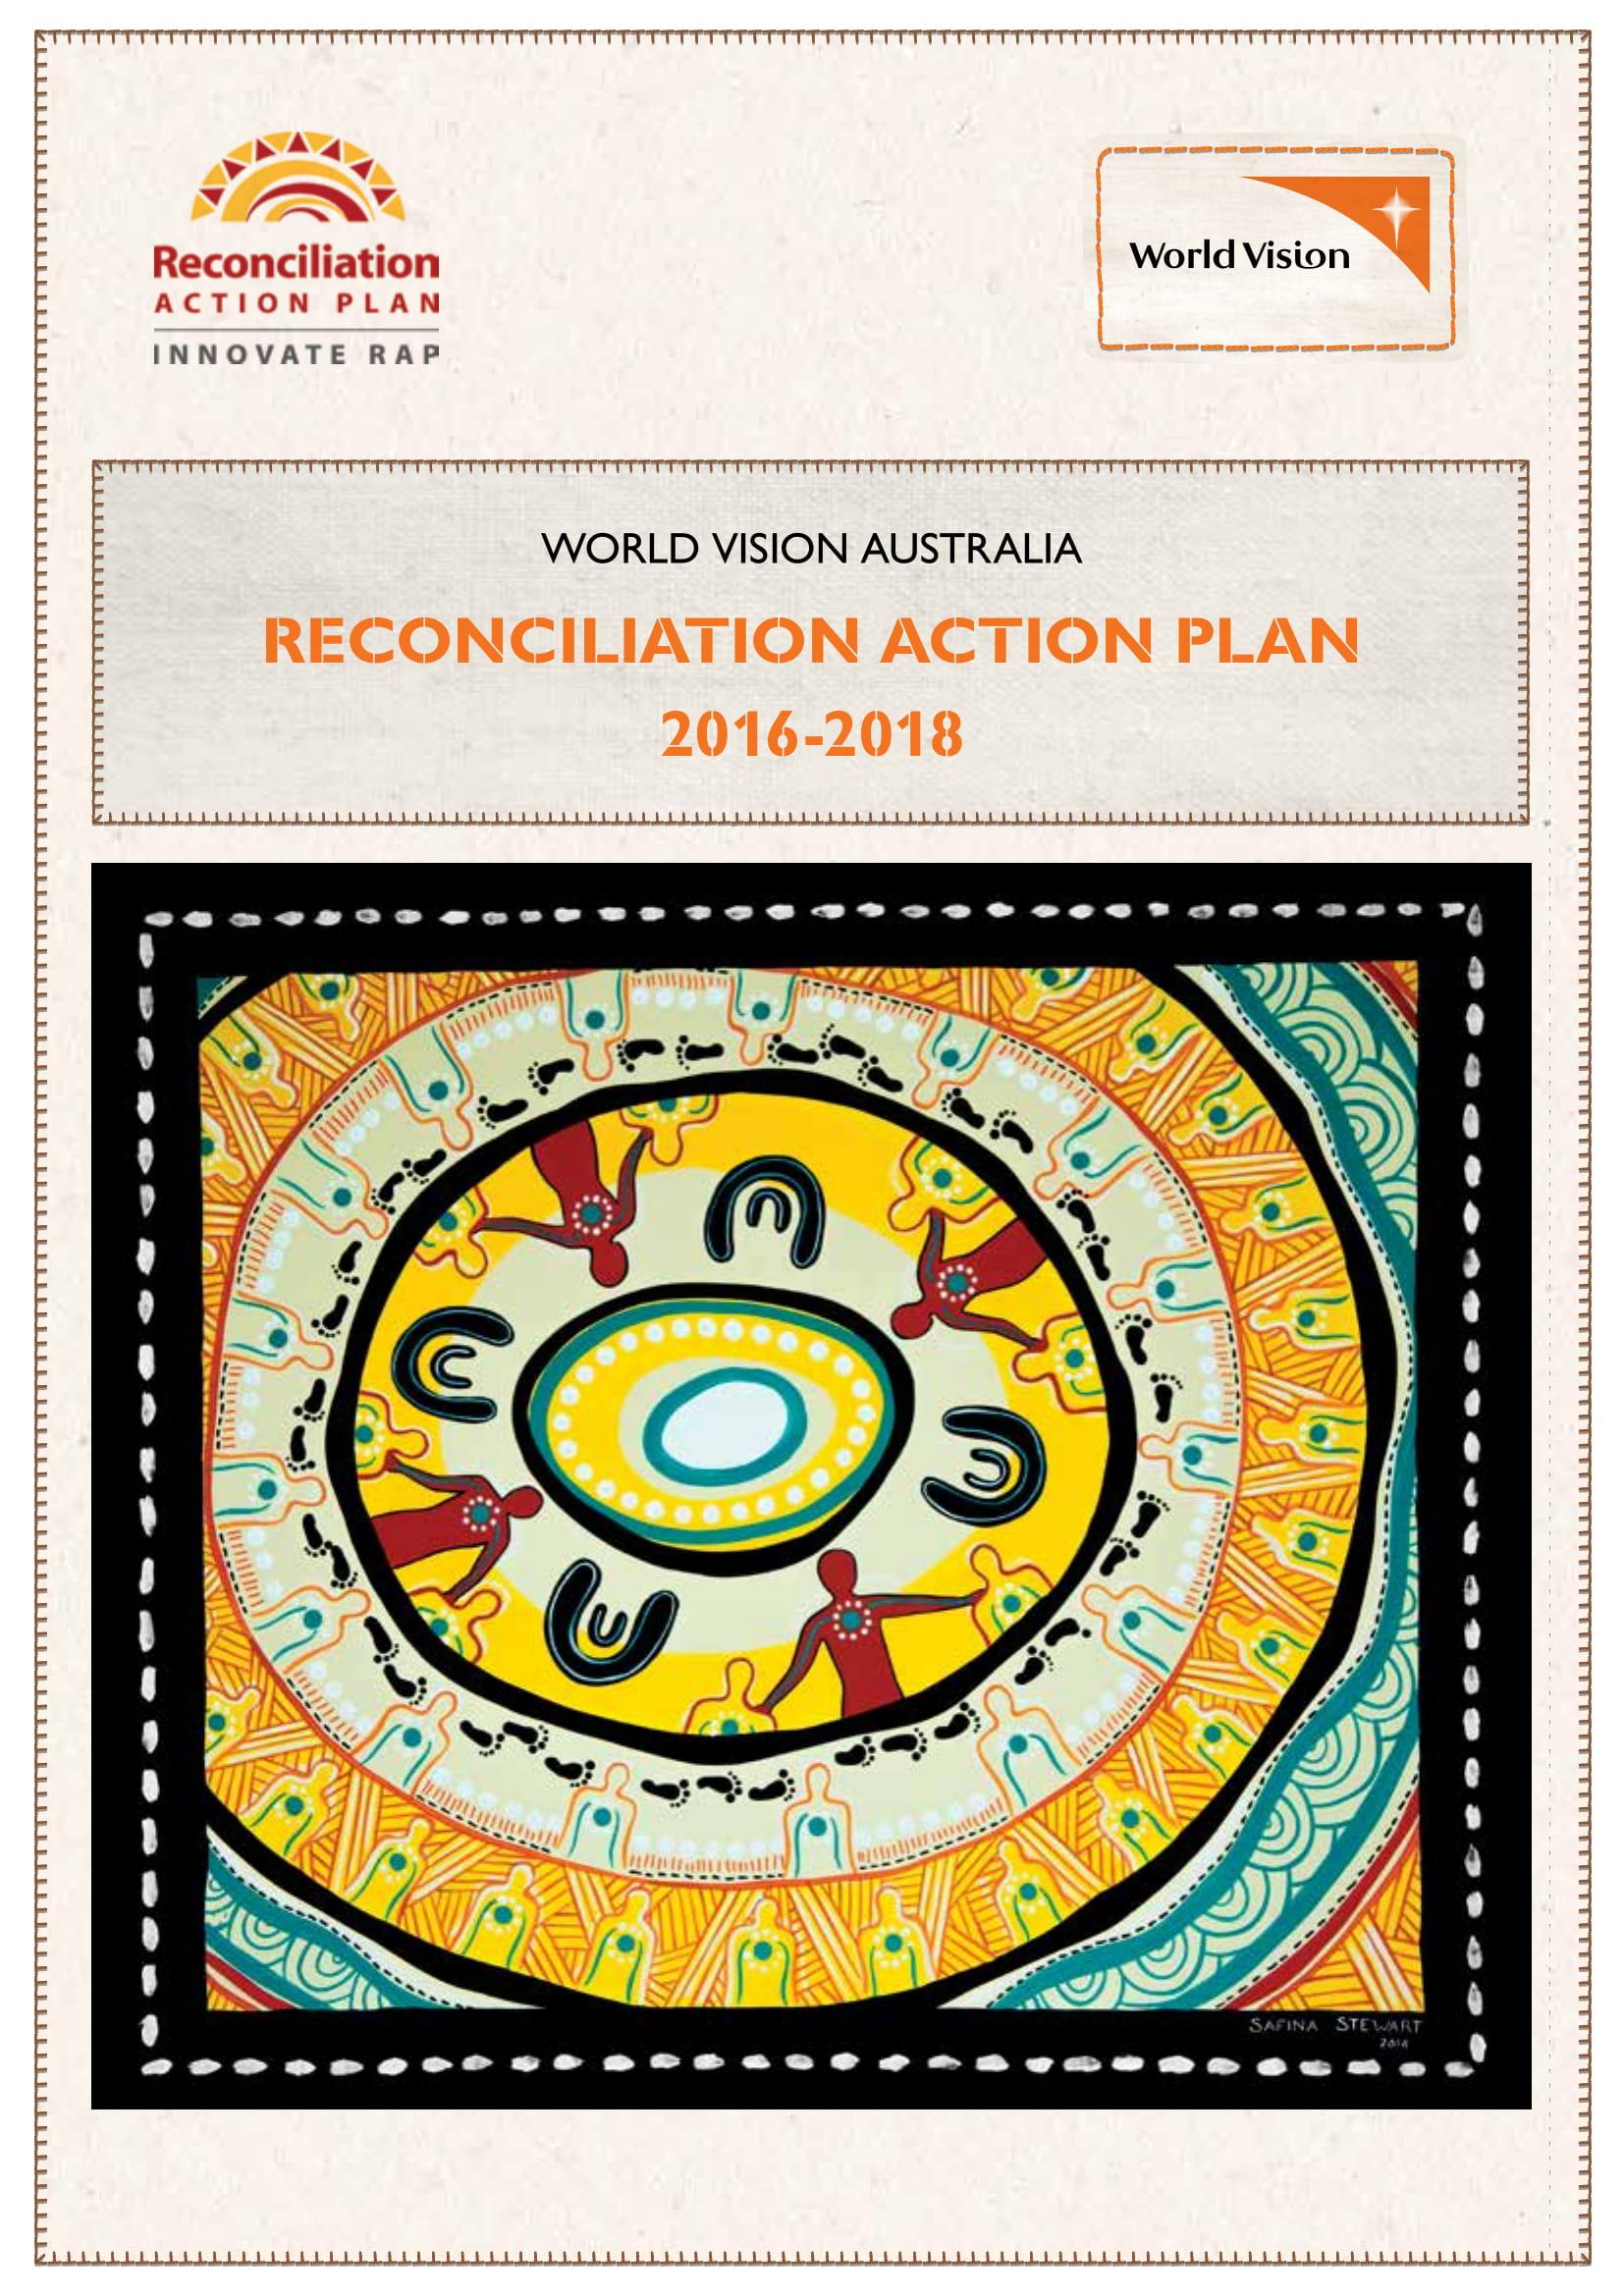 simple reconciliation action plan example 01